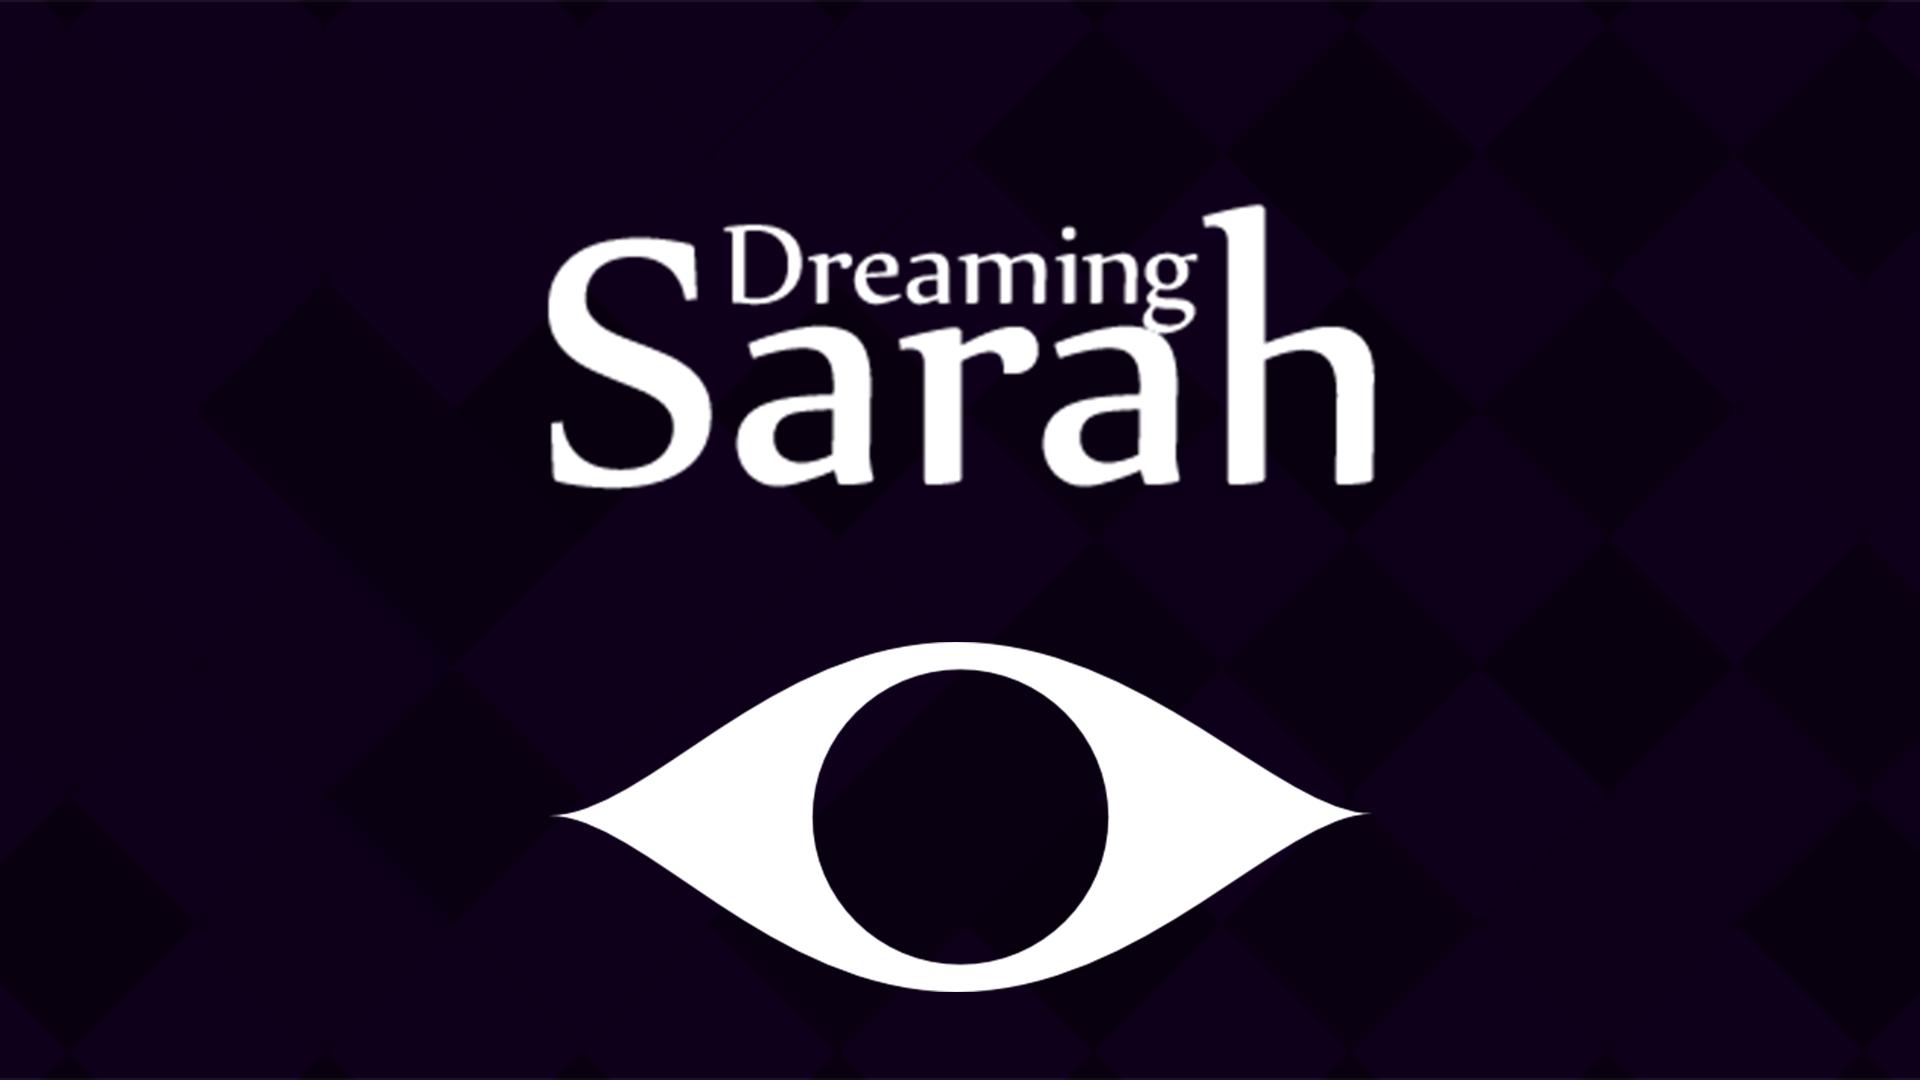 dreaming sarah logo wallpaper 73766